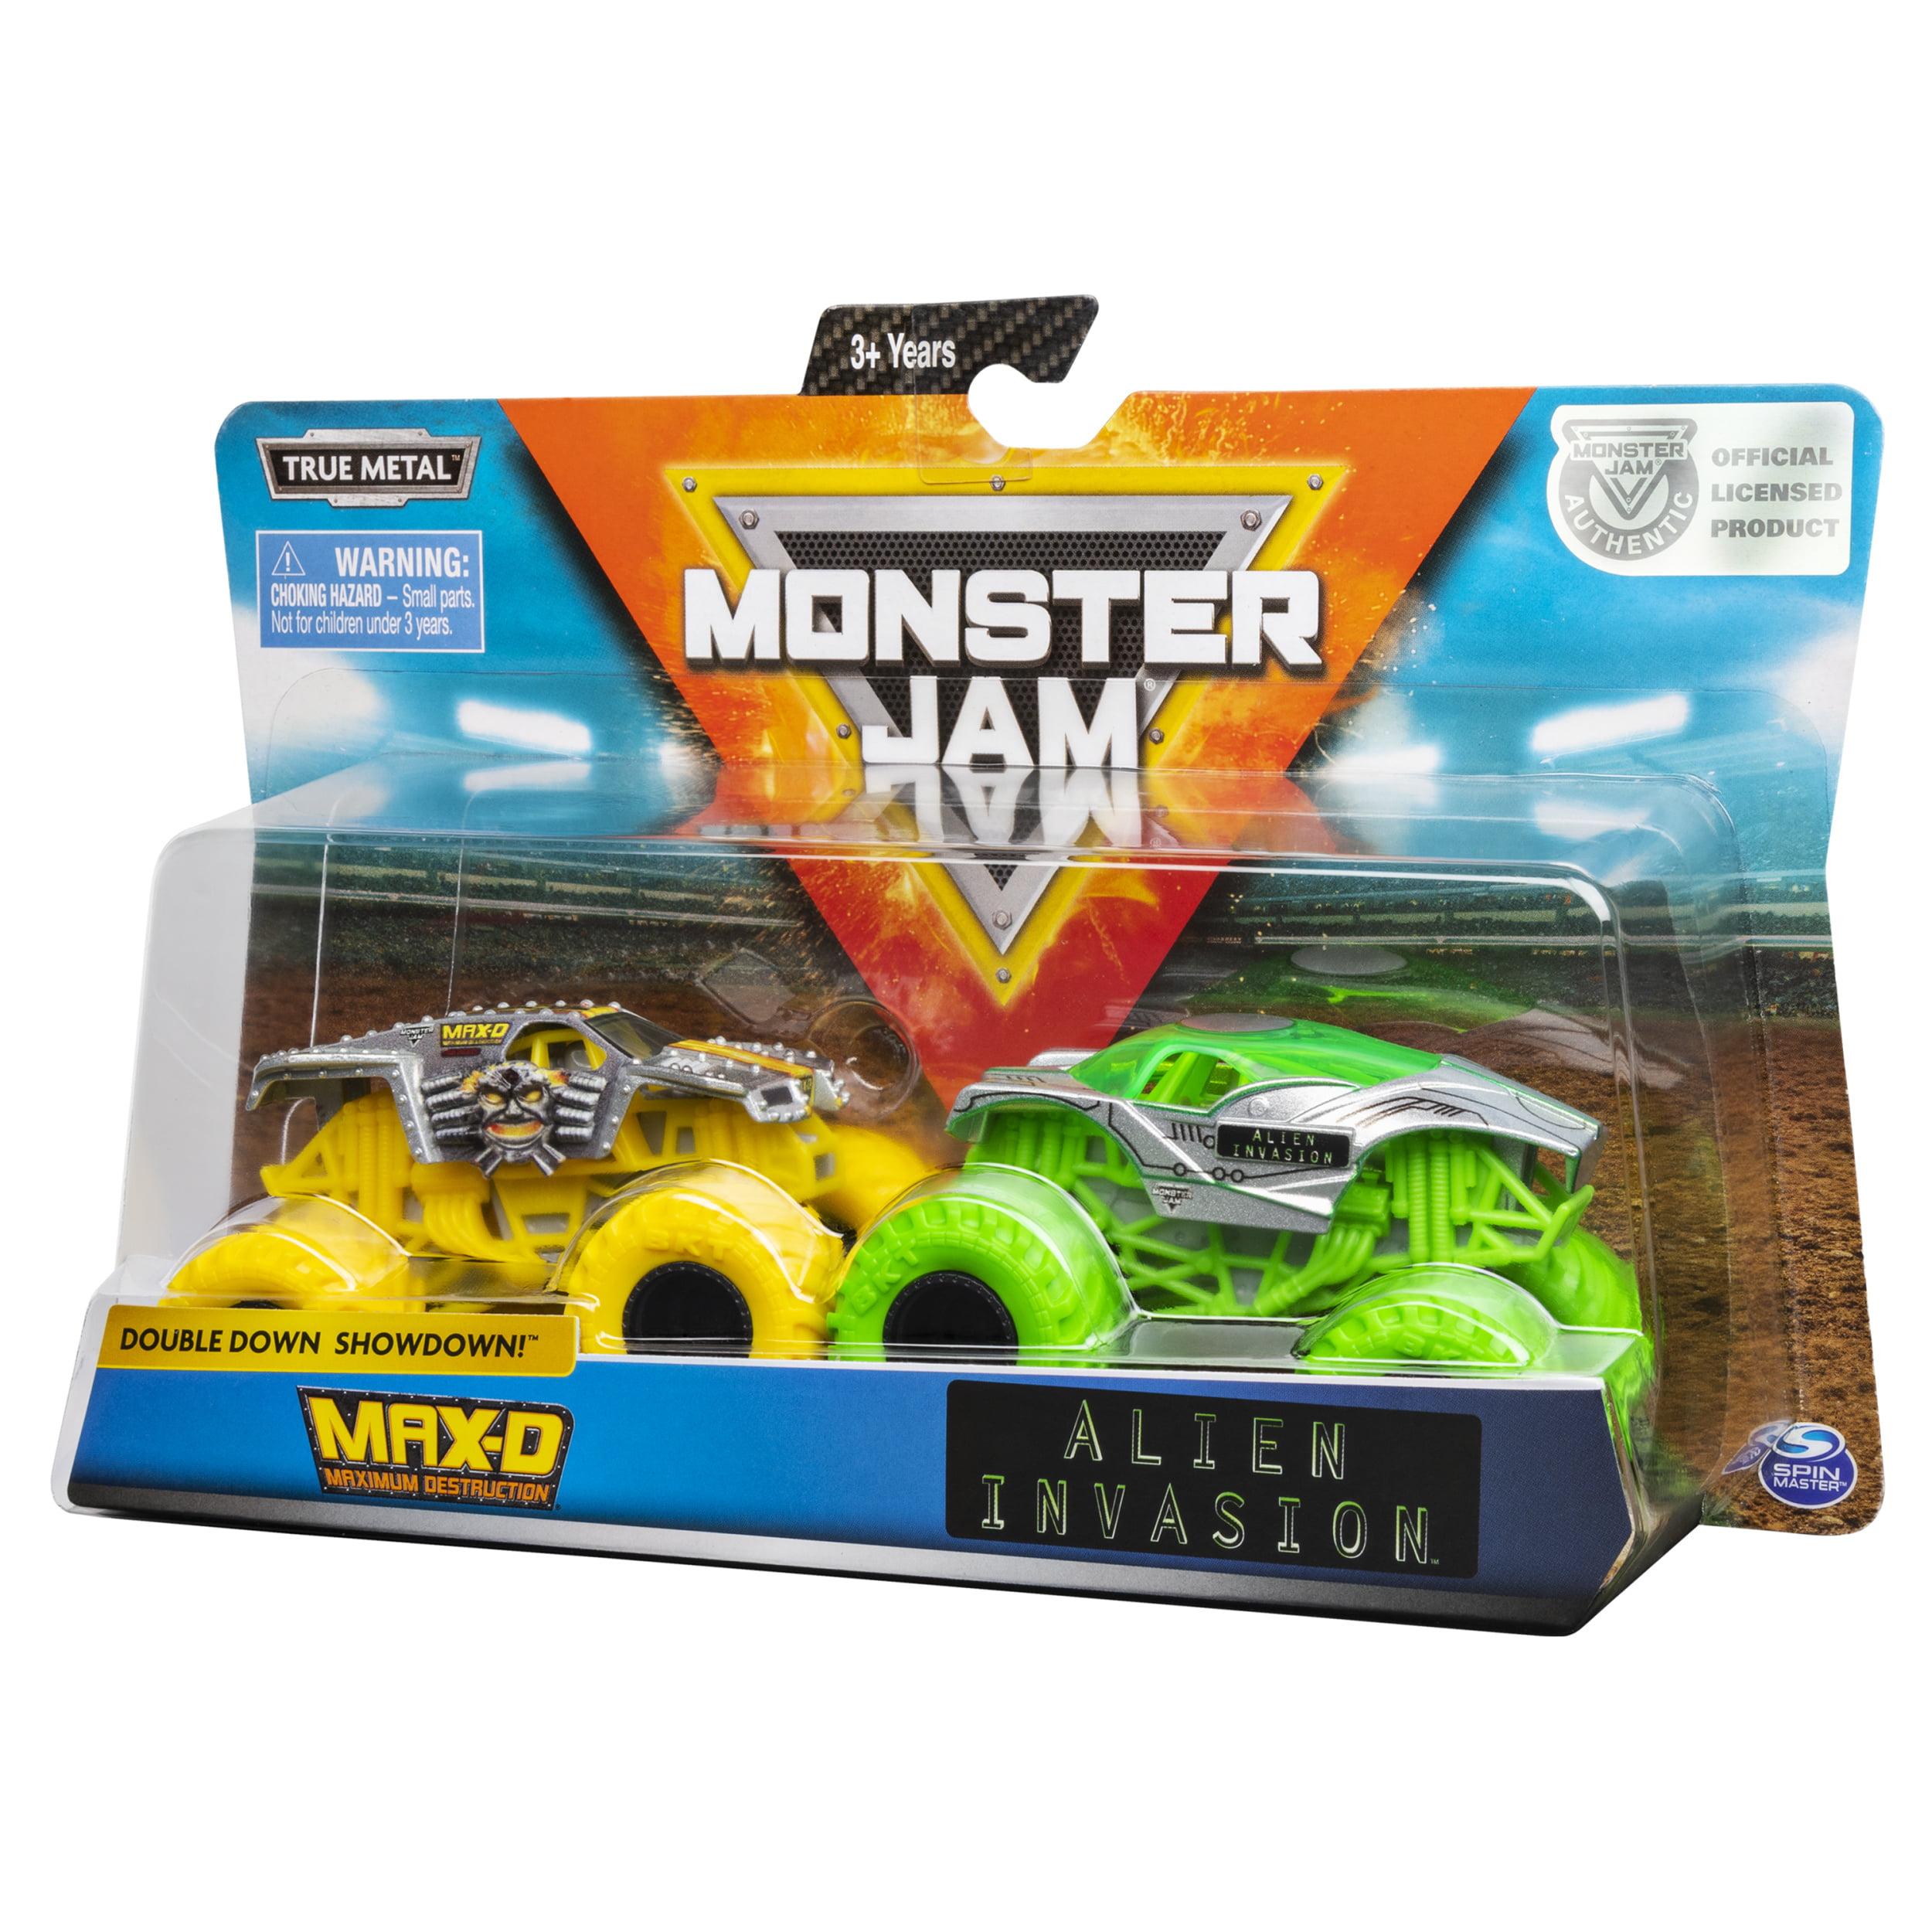 Monster Jam Official Max D Vs Alien Invasion Die Cast Monster Trucks 1 64 Scale 2 Pack Walmart Com Walmart Com